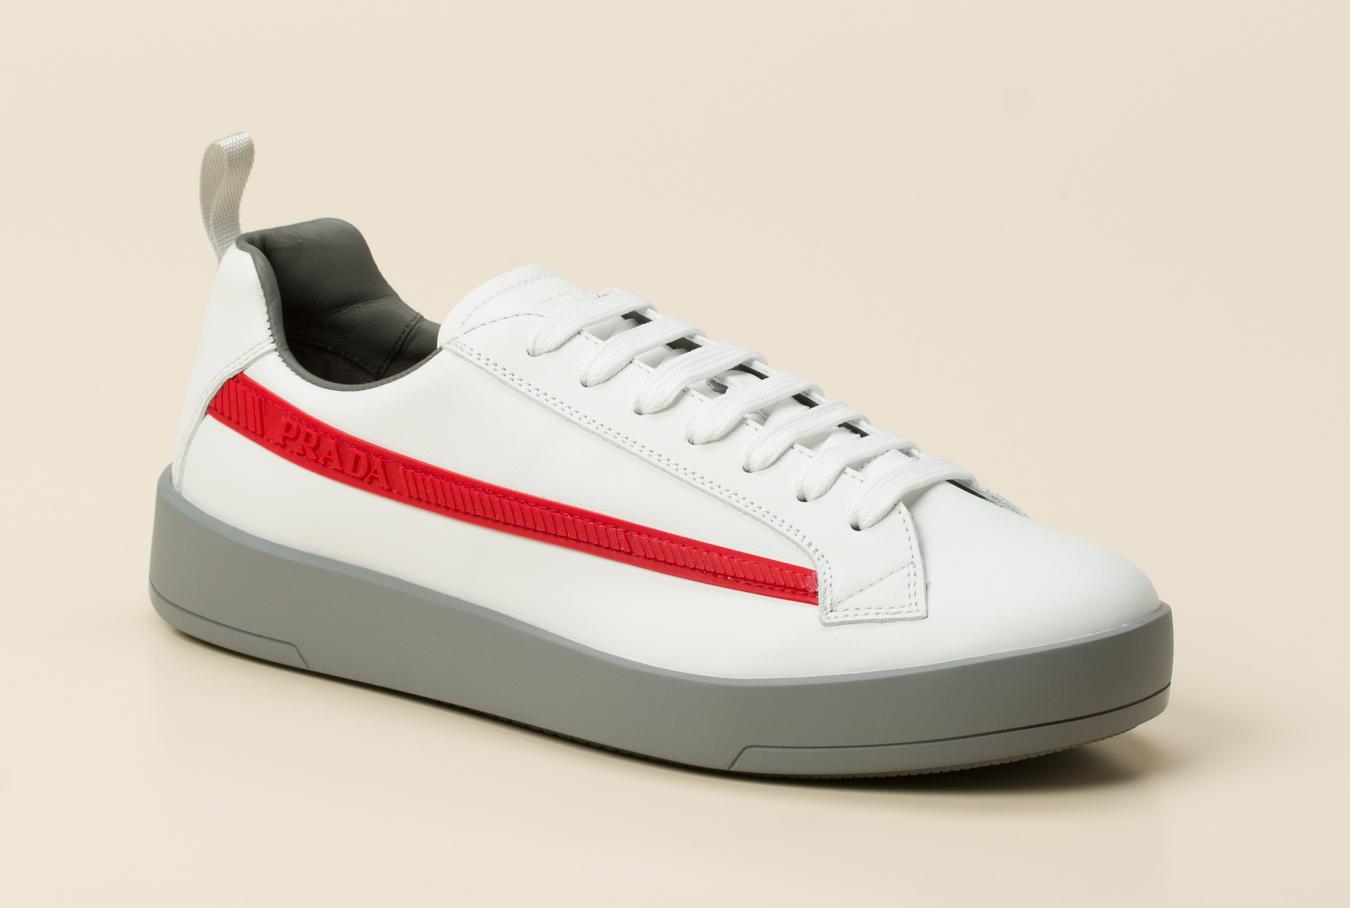 eae9f1979f3dc Prada Linea Rossa Herren Sneaker in weiß kaufen